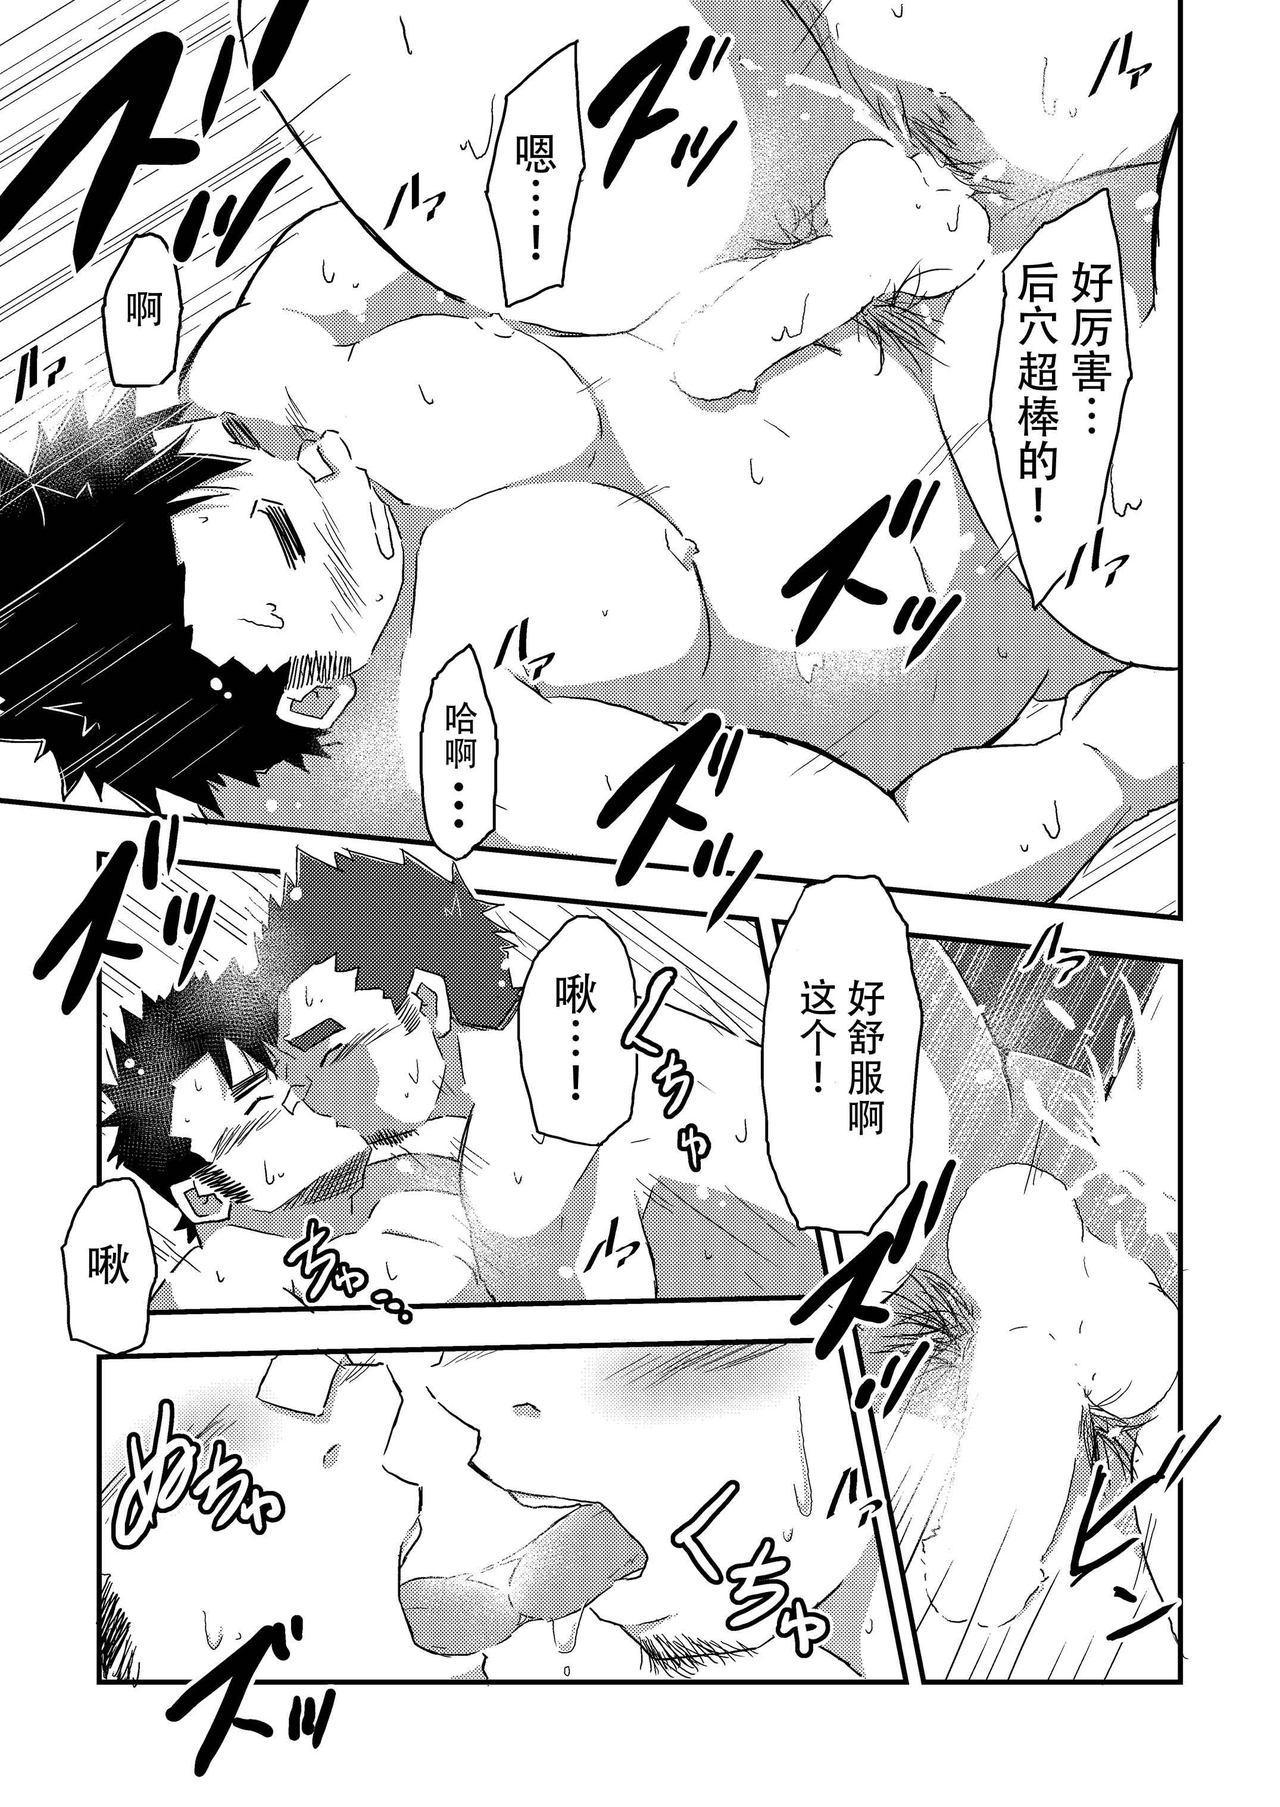 [CorkBOX (ngng)] Ise-kun wa Tamatte Iru. - Ise-kun is horny. [Chinese] {日曜日汉化} [Digital] 23